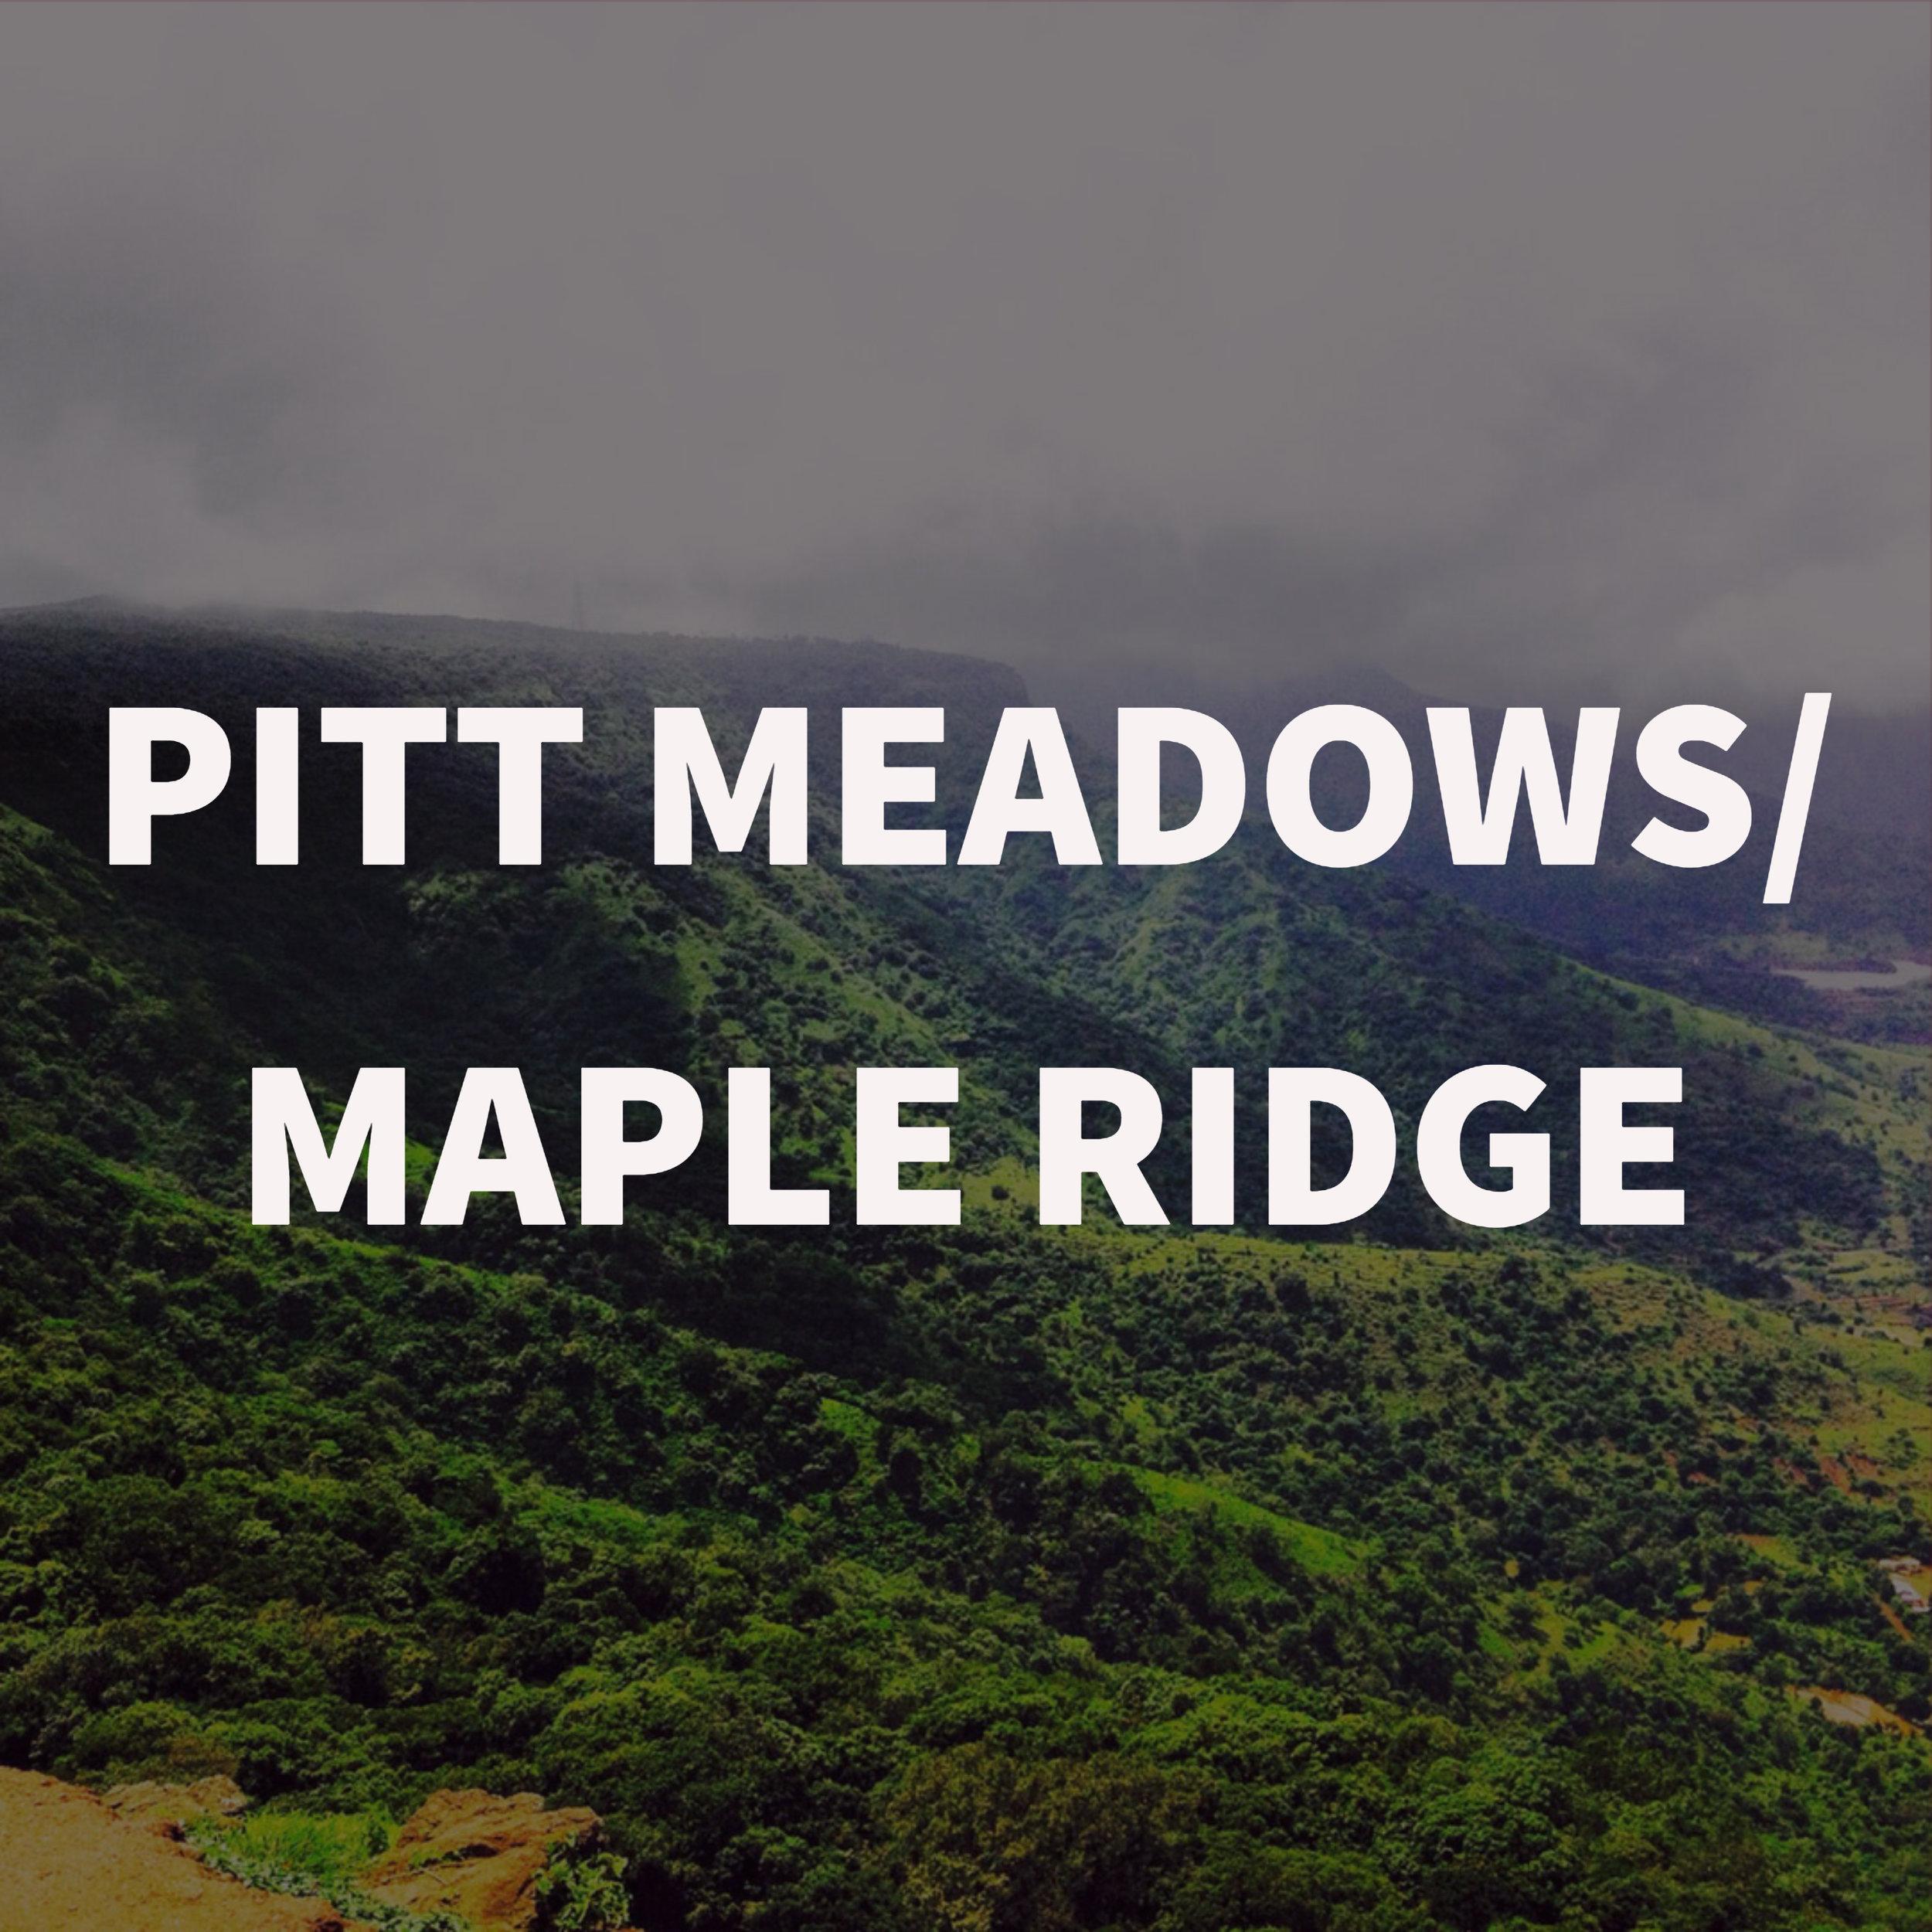 Pitt Meadows_Maple Ridge.jpg